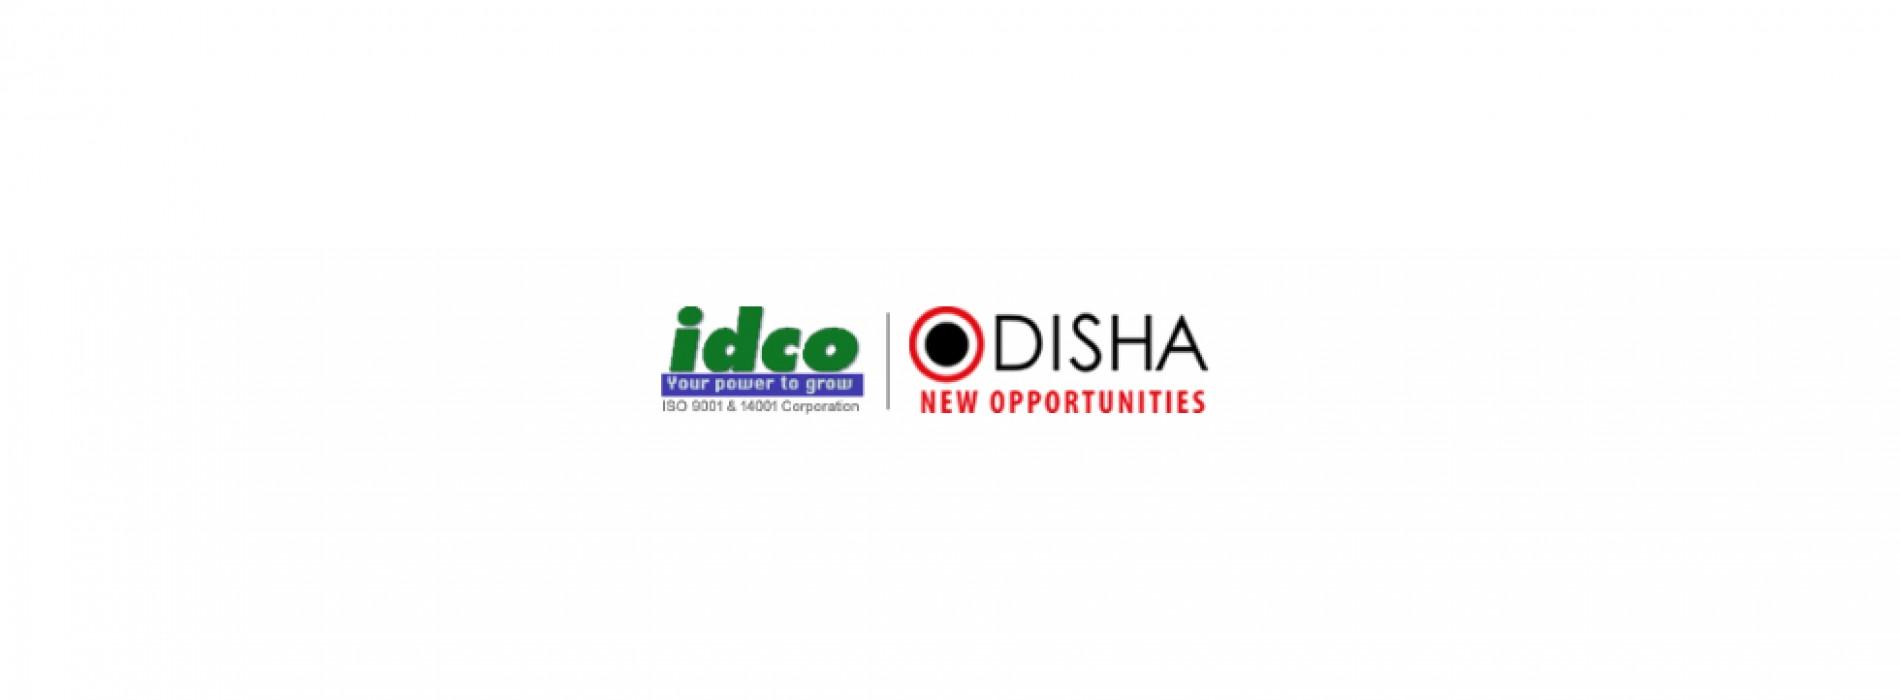 Odisha introduces land regulation for industrial development